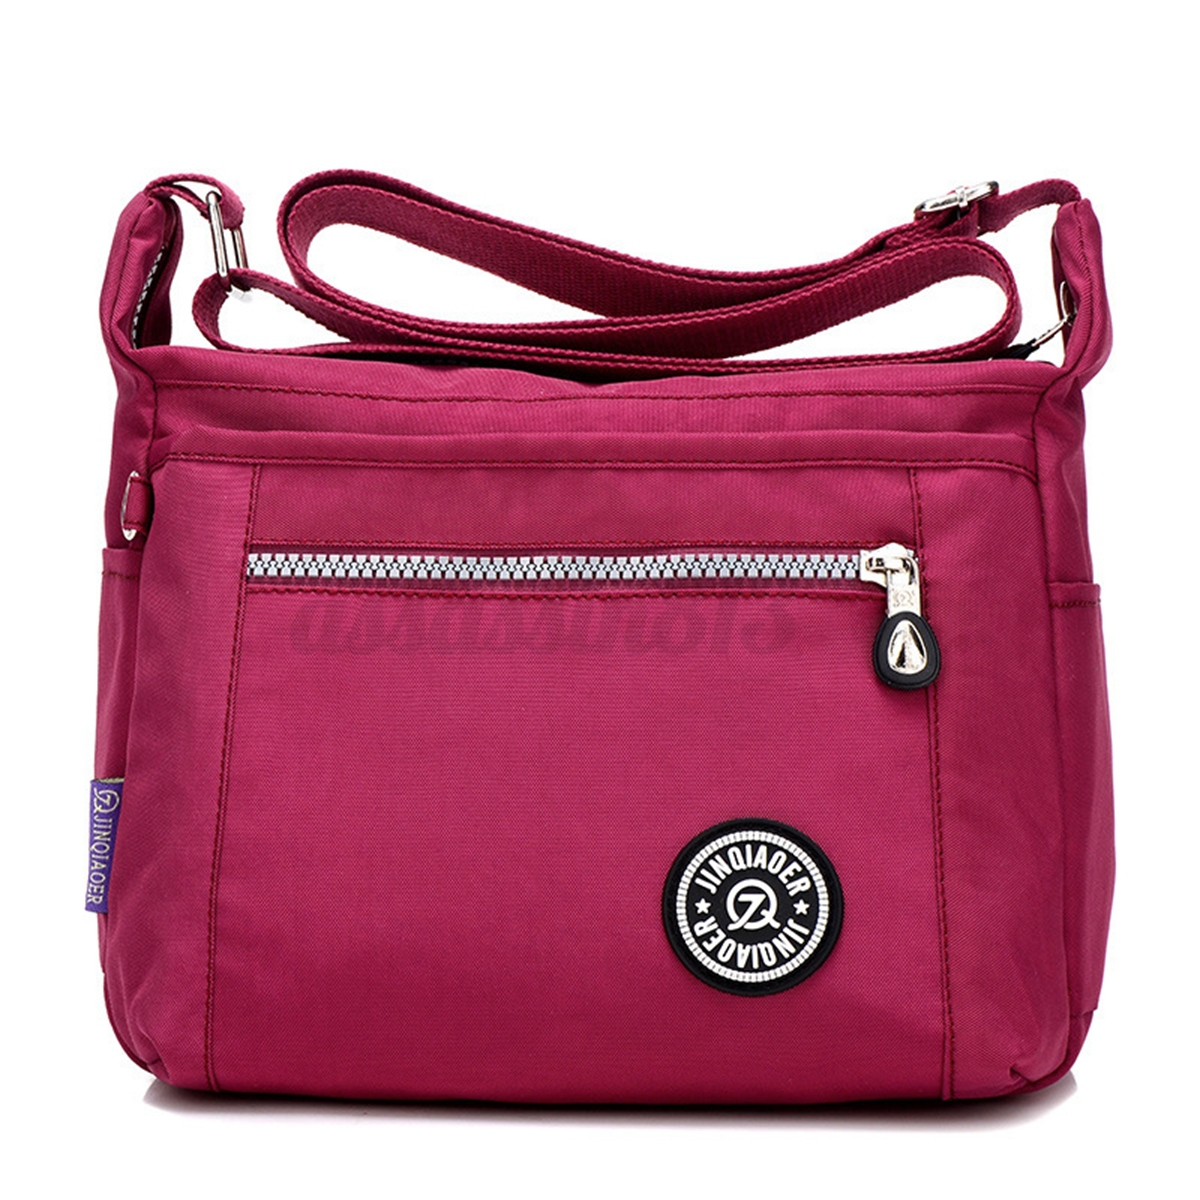 Waterproof Messenger Bag >> Women Lady Waterproof Nylon Purse Shoulder Bag Crossbody Messenger Tote Handbag   eBay